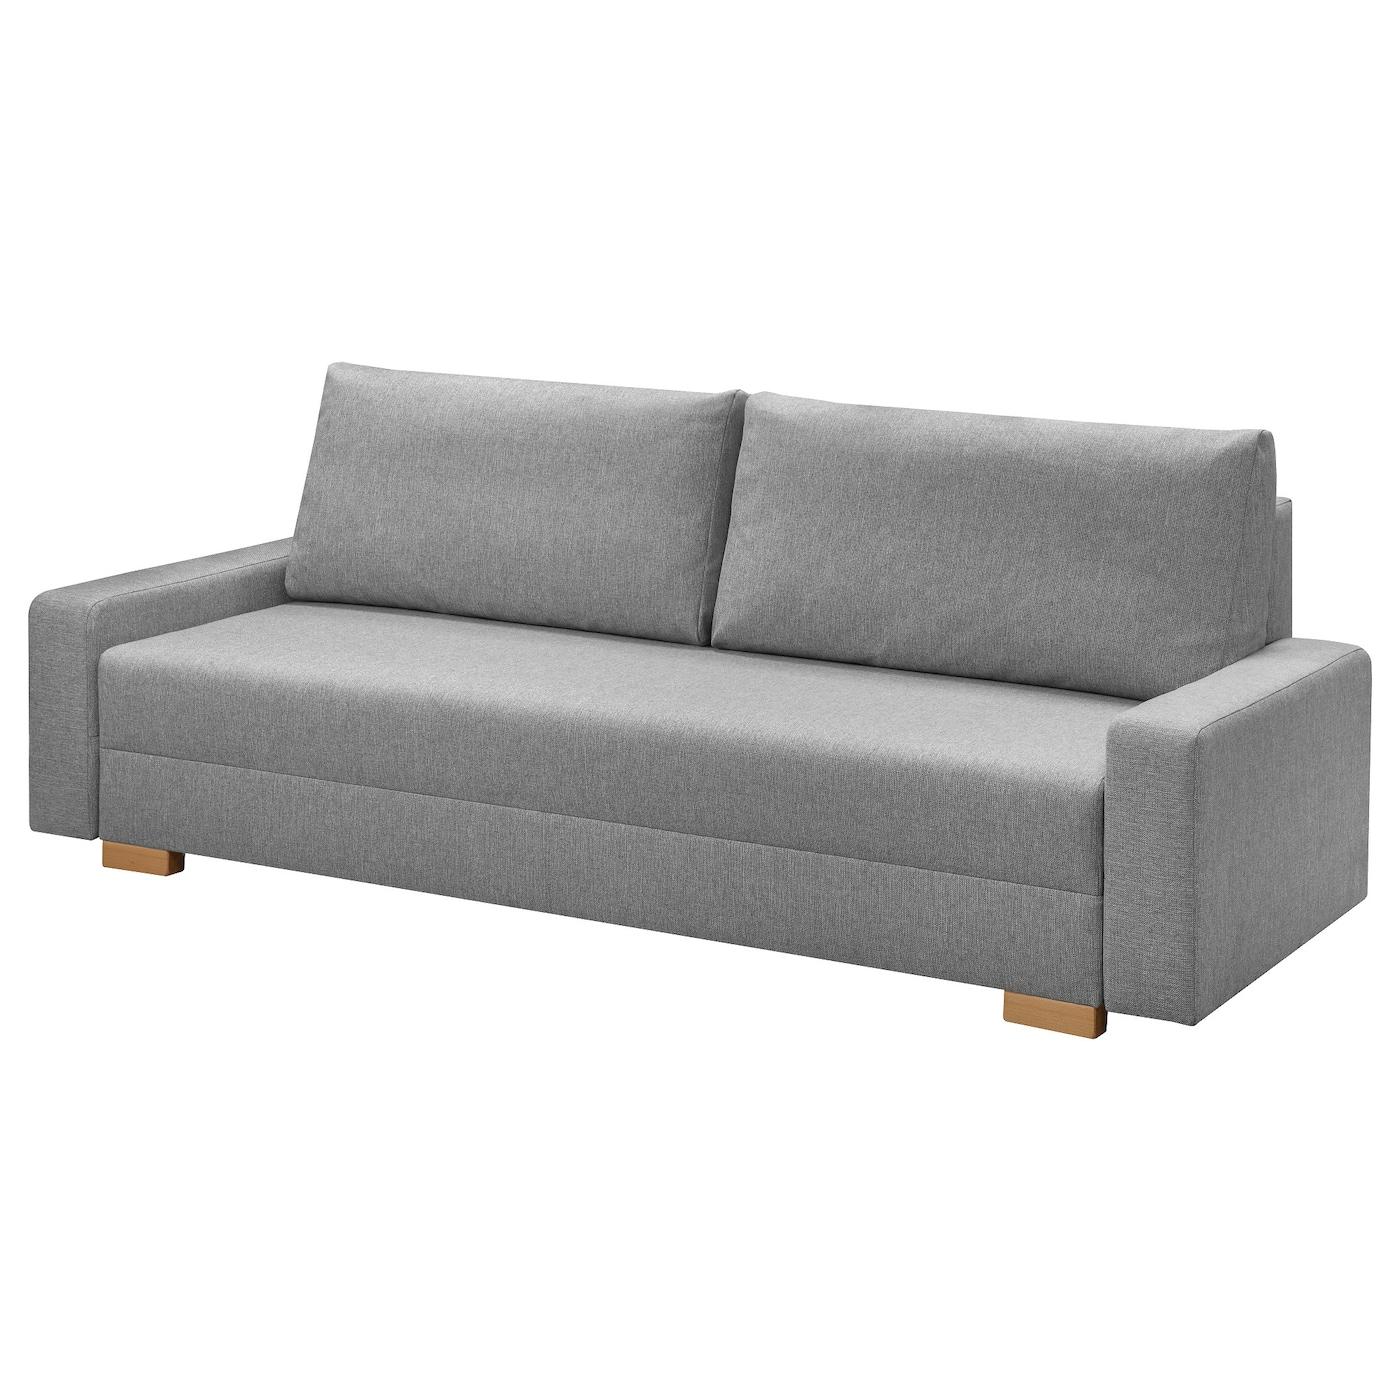 Ikea GrÄlviken 3 Seat Sofa Bed Readily Converts Into A